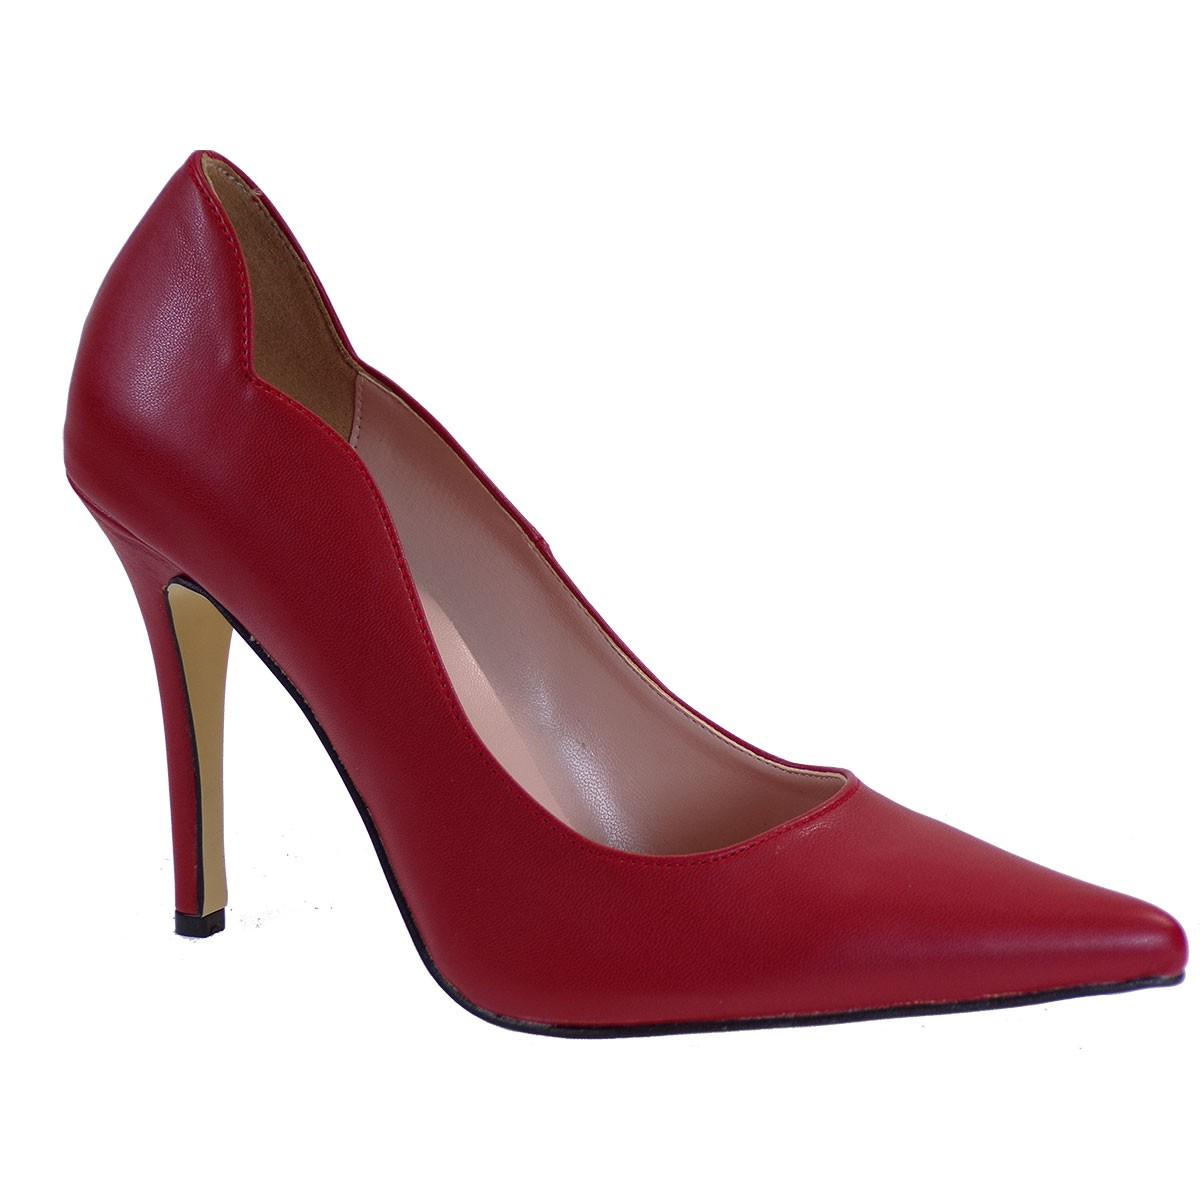 Alessandra Paggioti Γυναικεία Παπούτσια Γόβες 89122 Κόκκινο Ματ